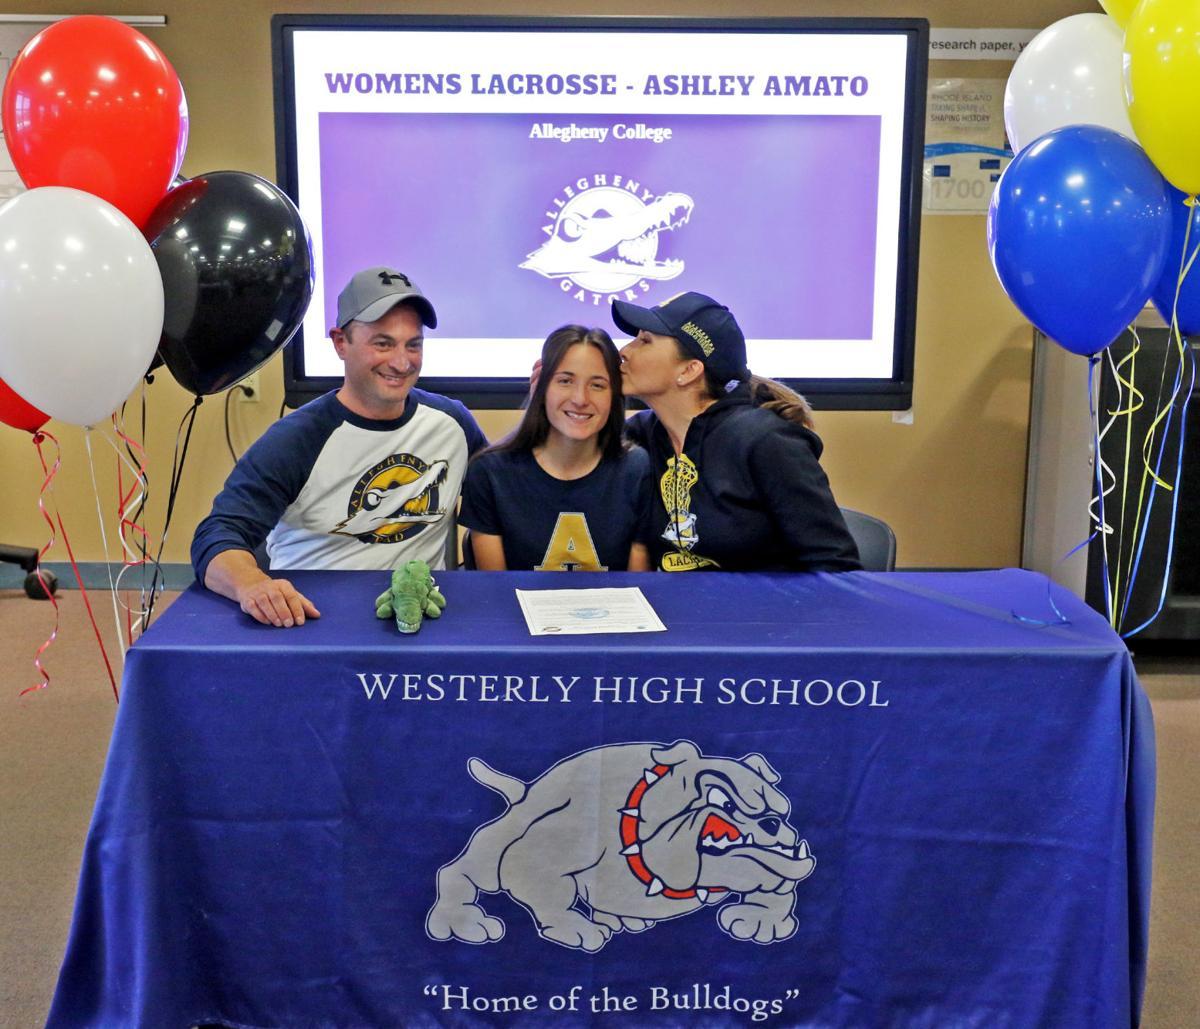 111319 SPT WHS Ashley Amato college signing 941.JPG